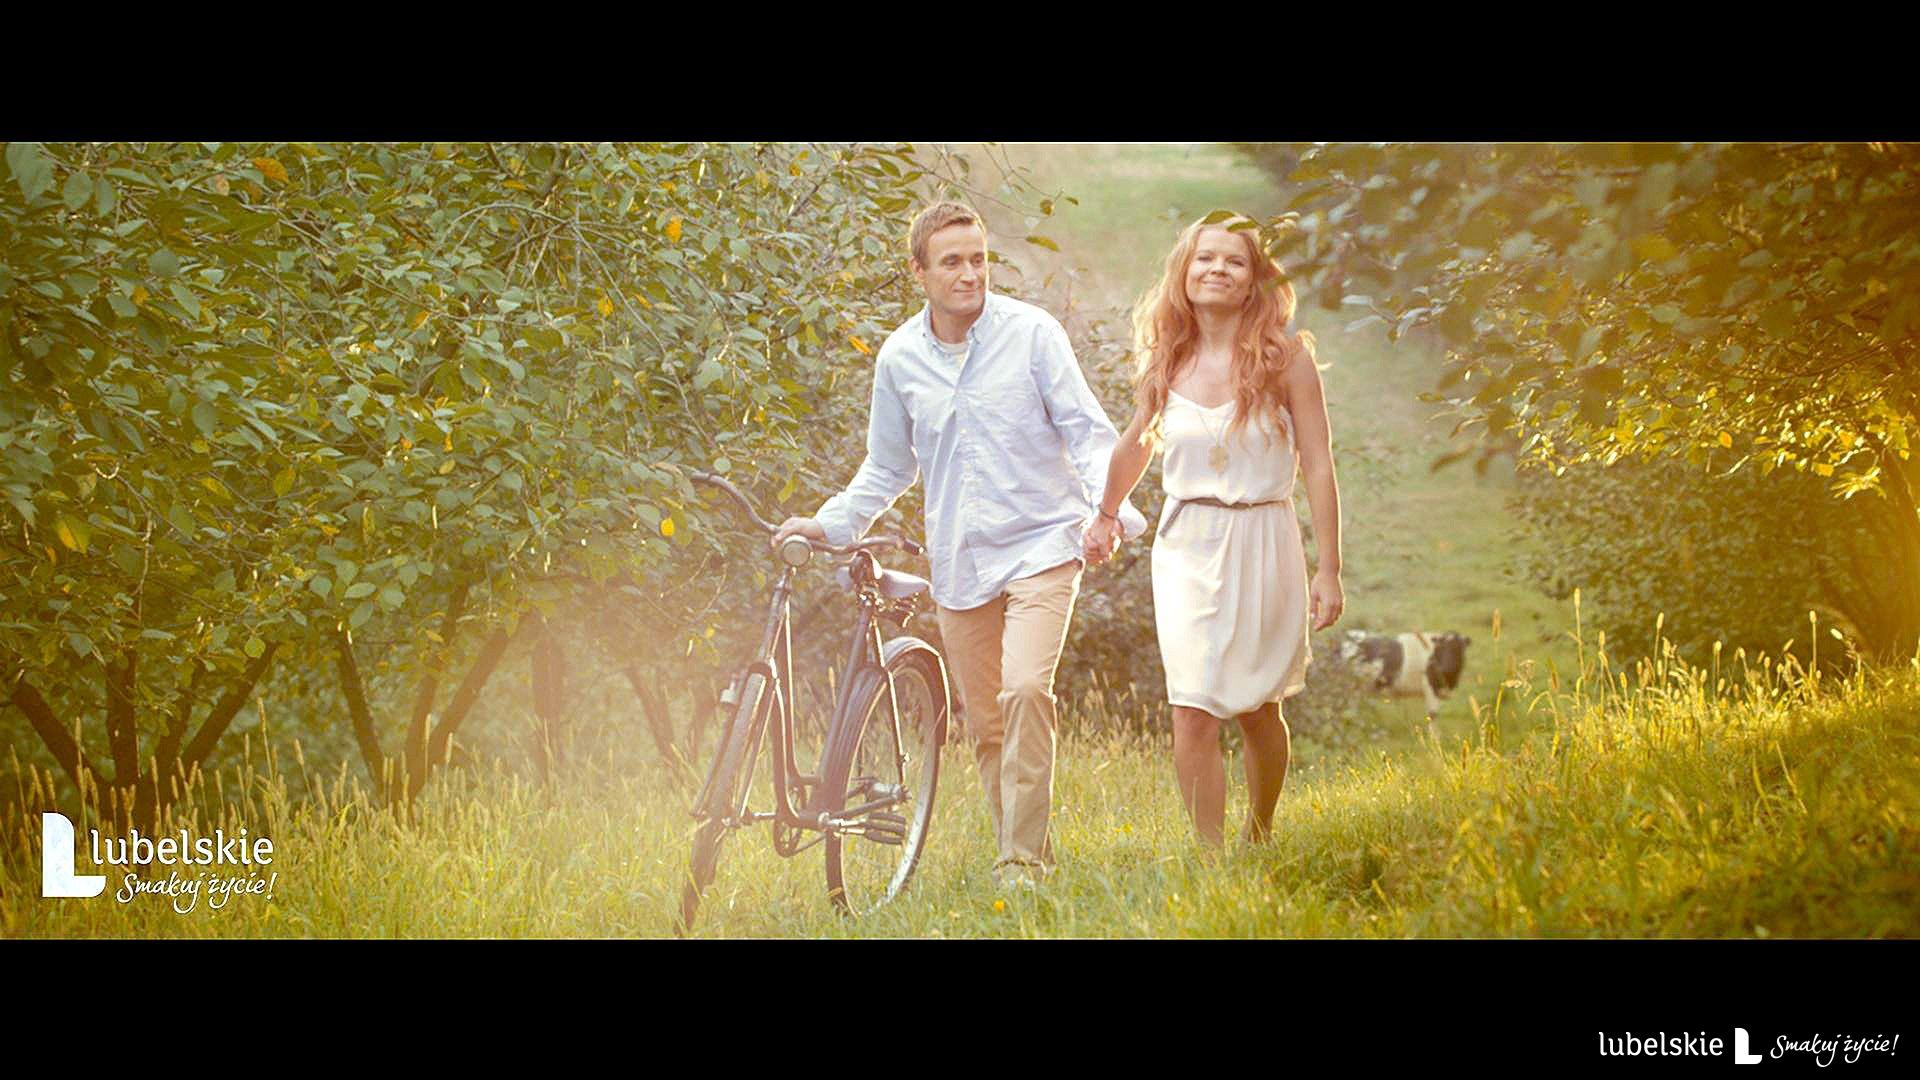 Lubelskie-na-chwilę-lub-na-dłużej-kadr-z-filmu-kampanii-2013-2014